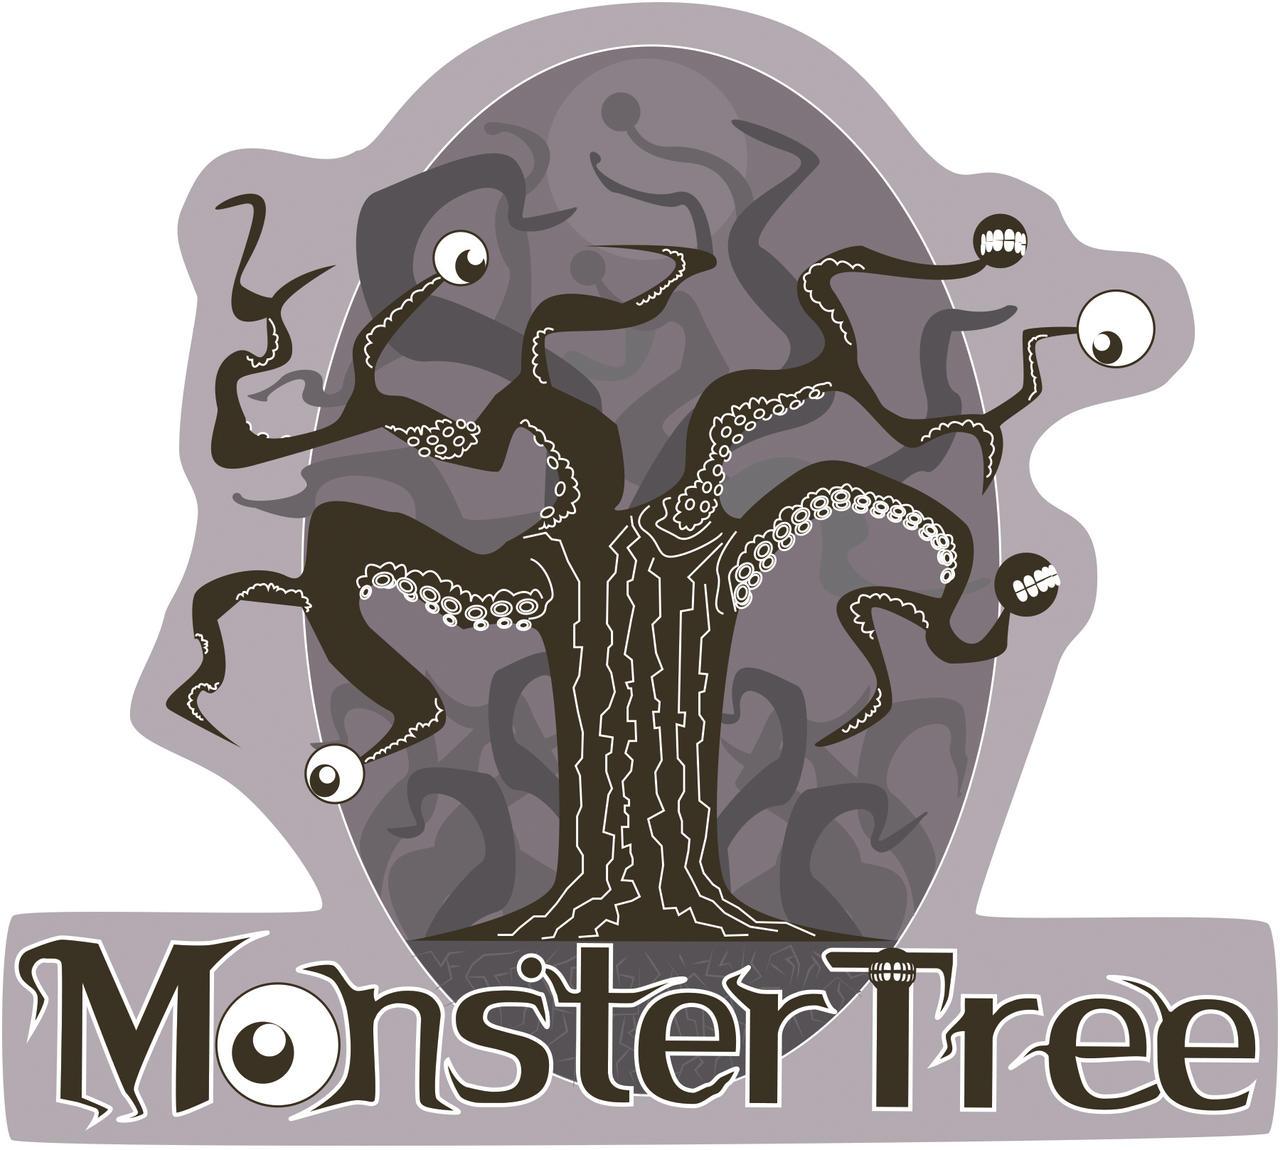 MonsterTreeLogo by GreenAirplane